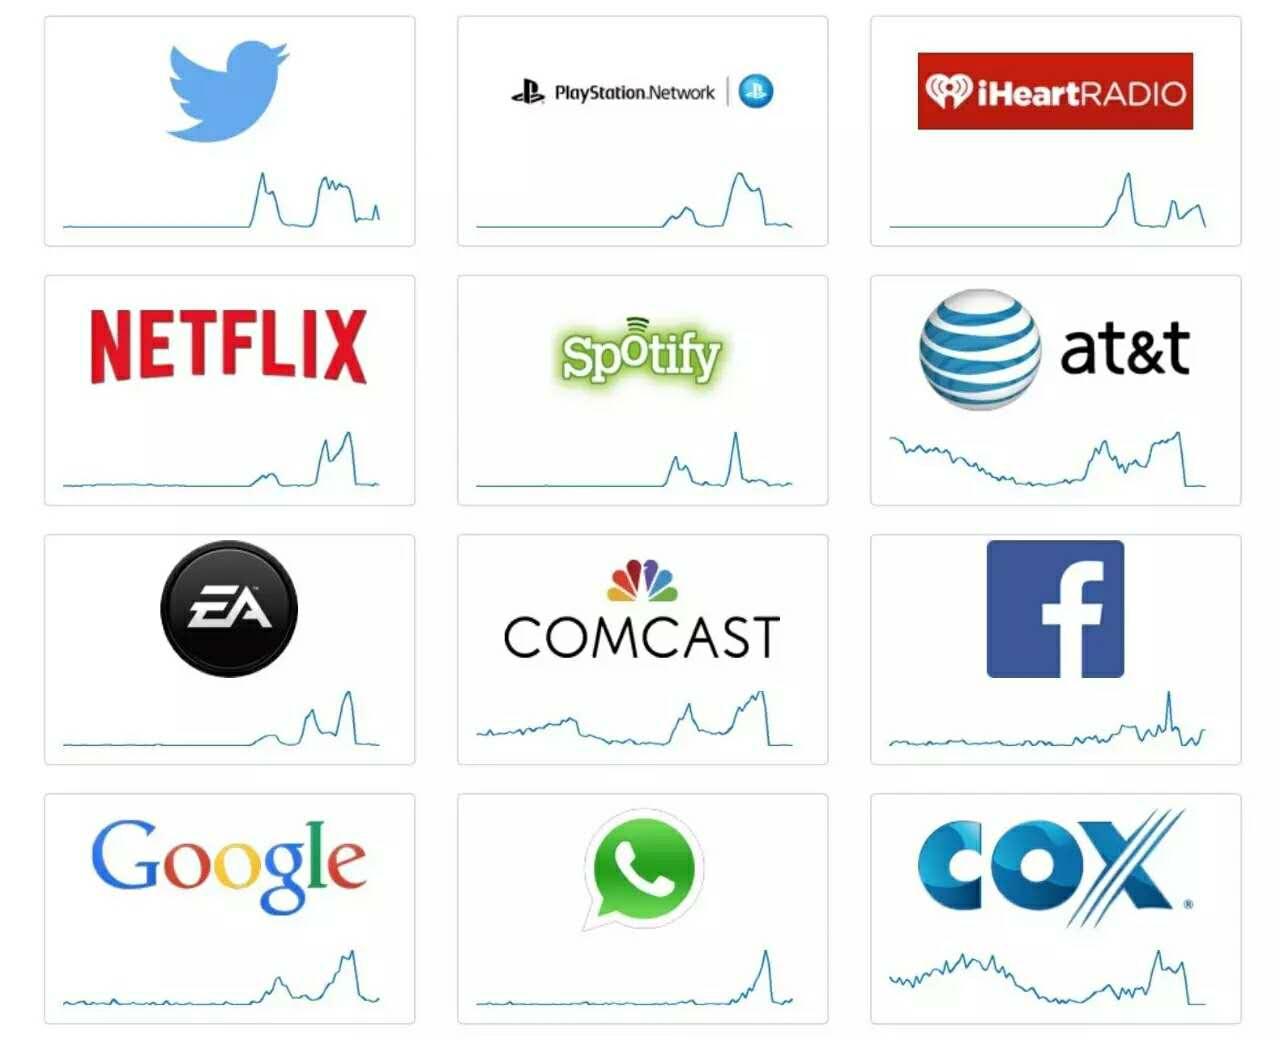 logo下方曲线表示无法访问的用户数量